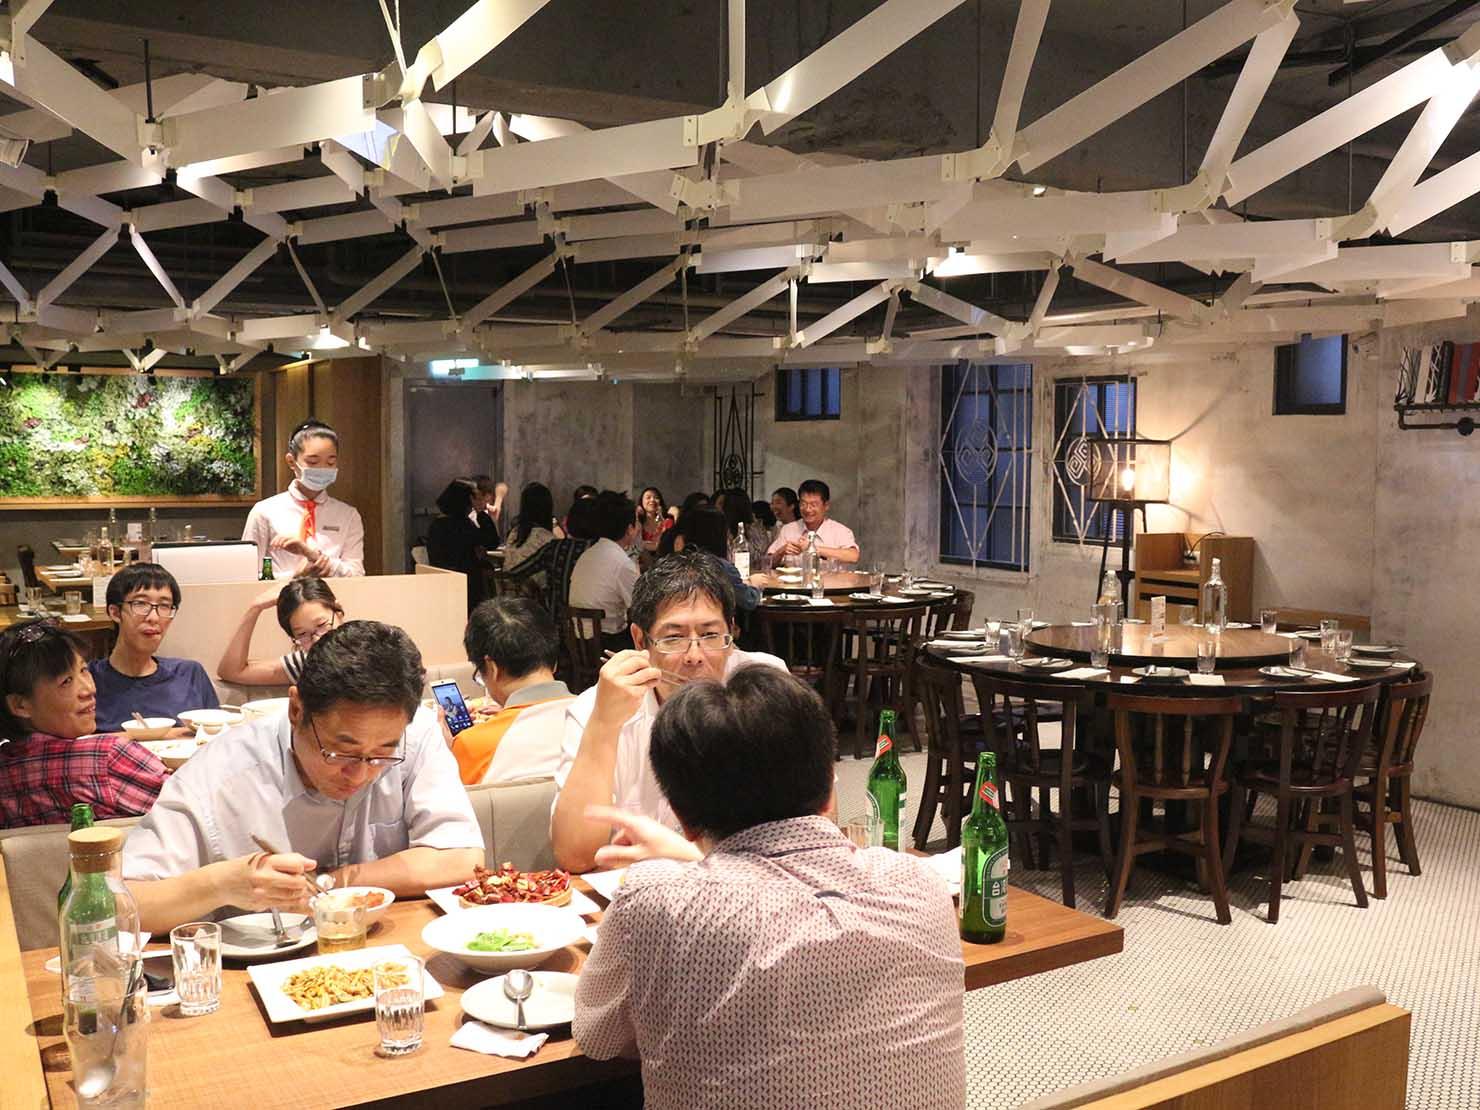 台北の本格派台湾料理店「參和院」の店内